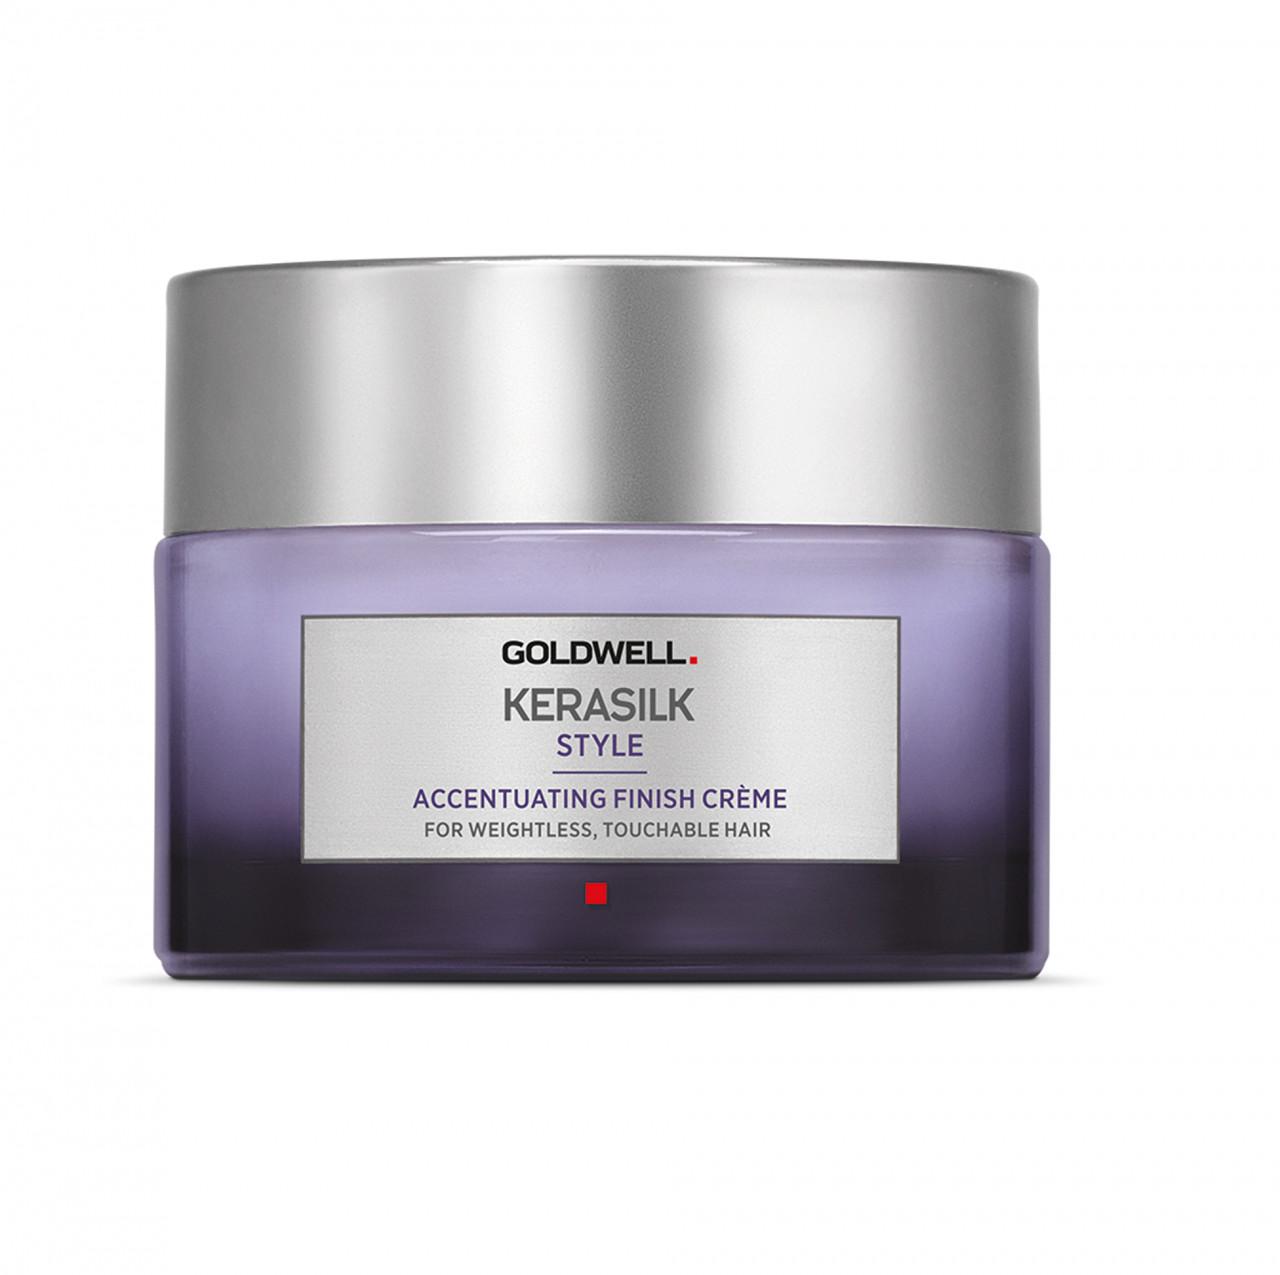 Goldwell Kerasilk Style veredelnde Finish Crème...